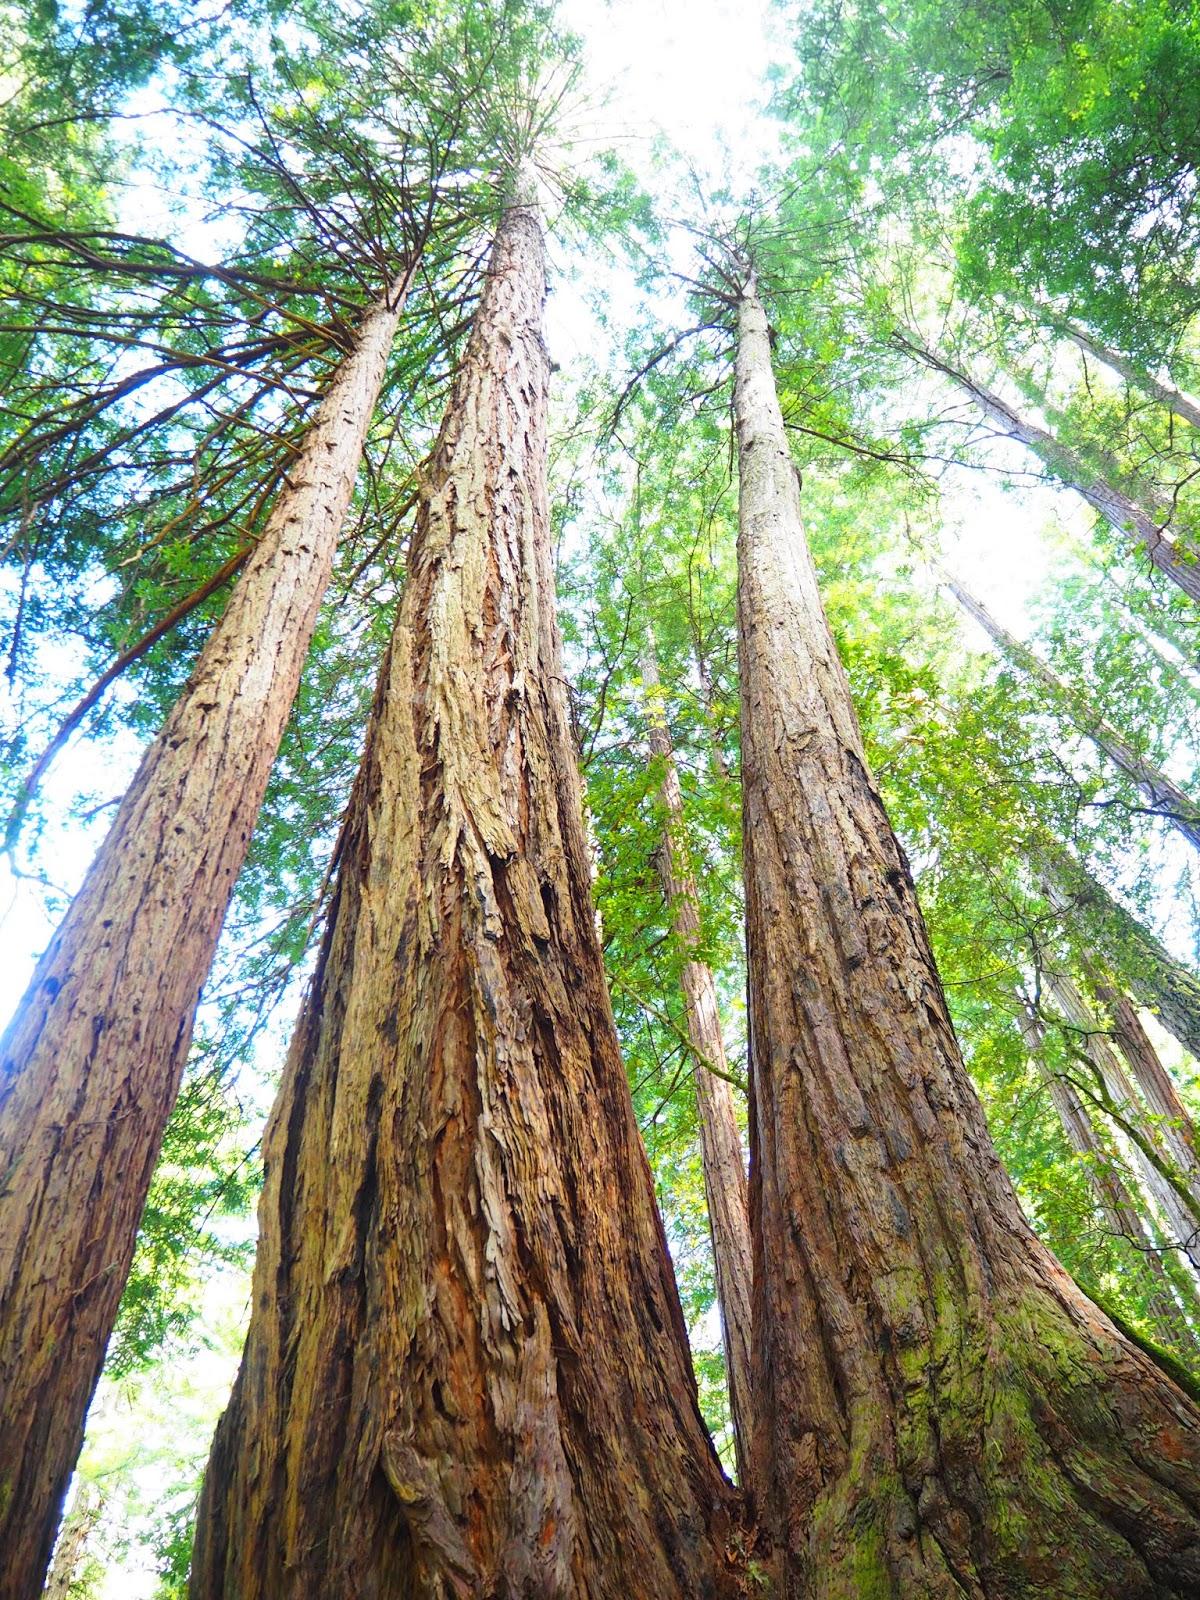 Visiting Muir Woods, San Francisco